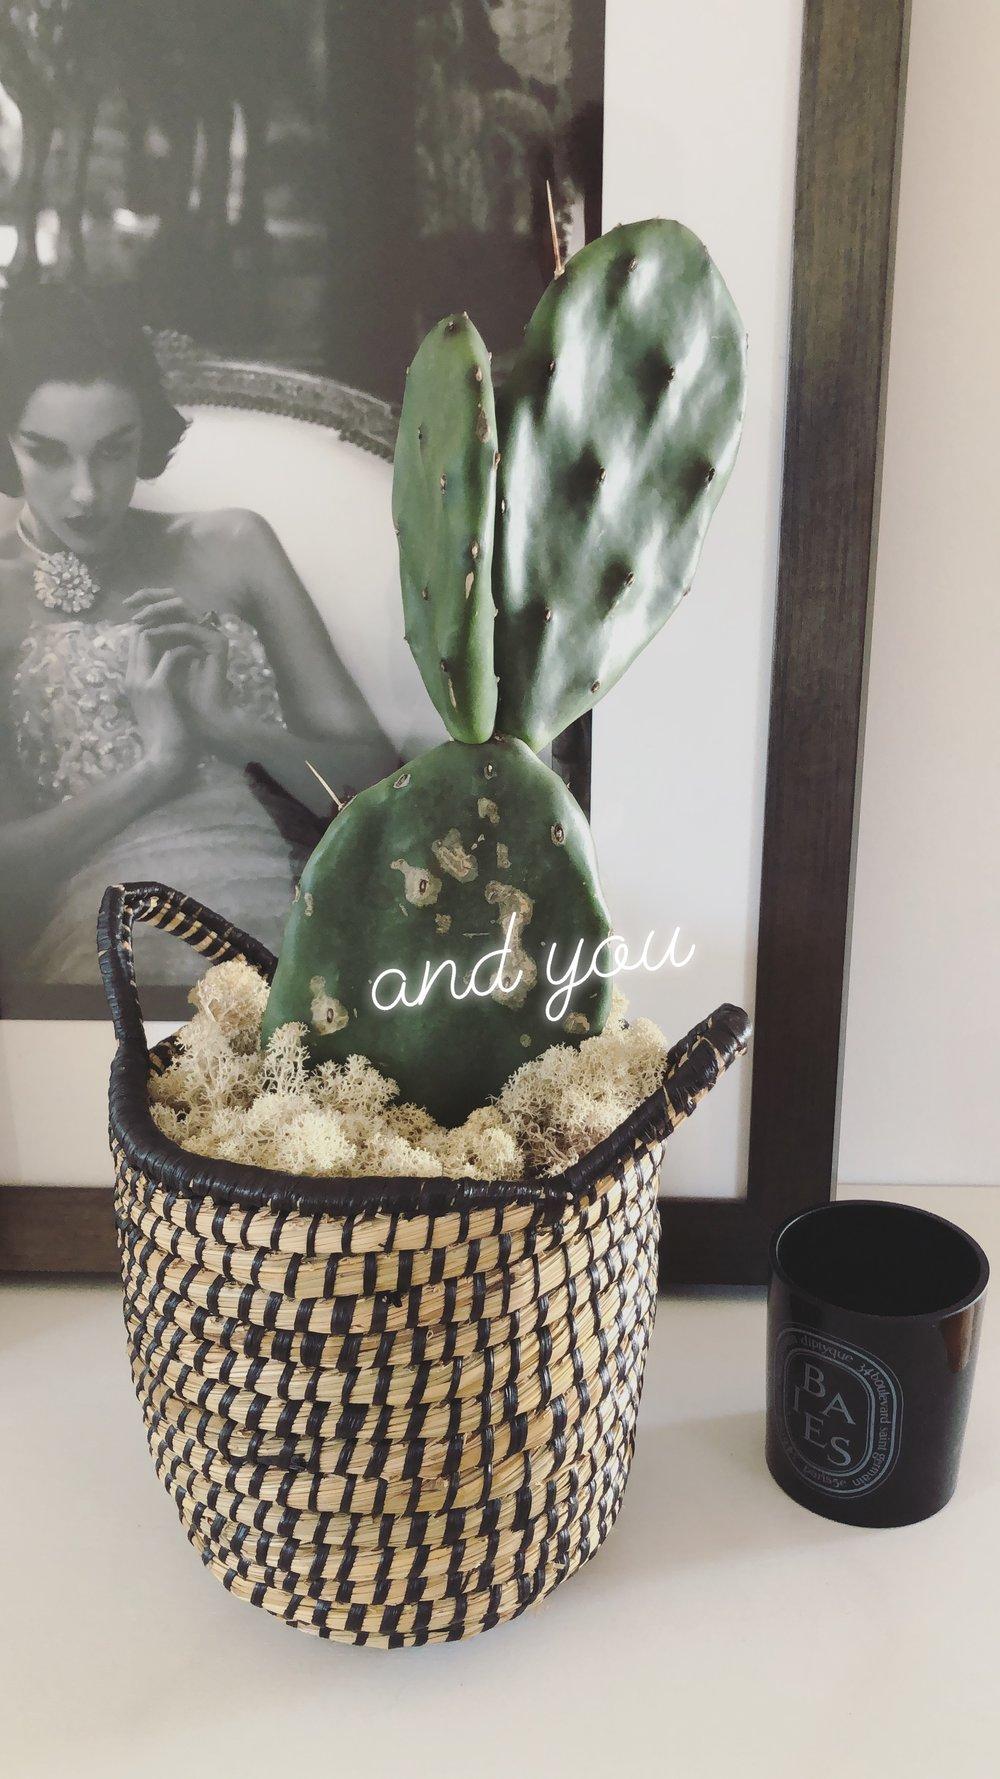 Cactus, $14.50 / Basket $25